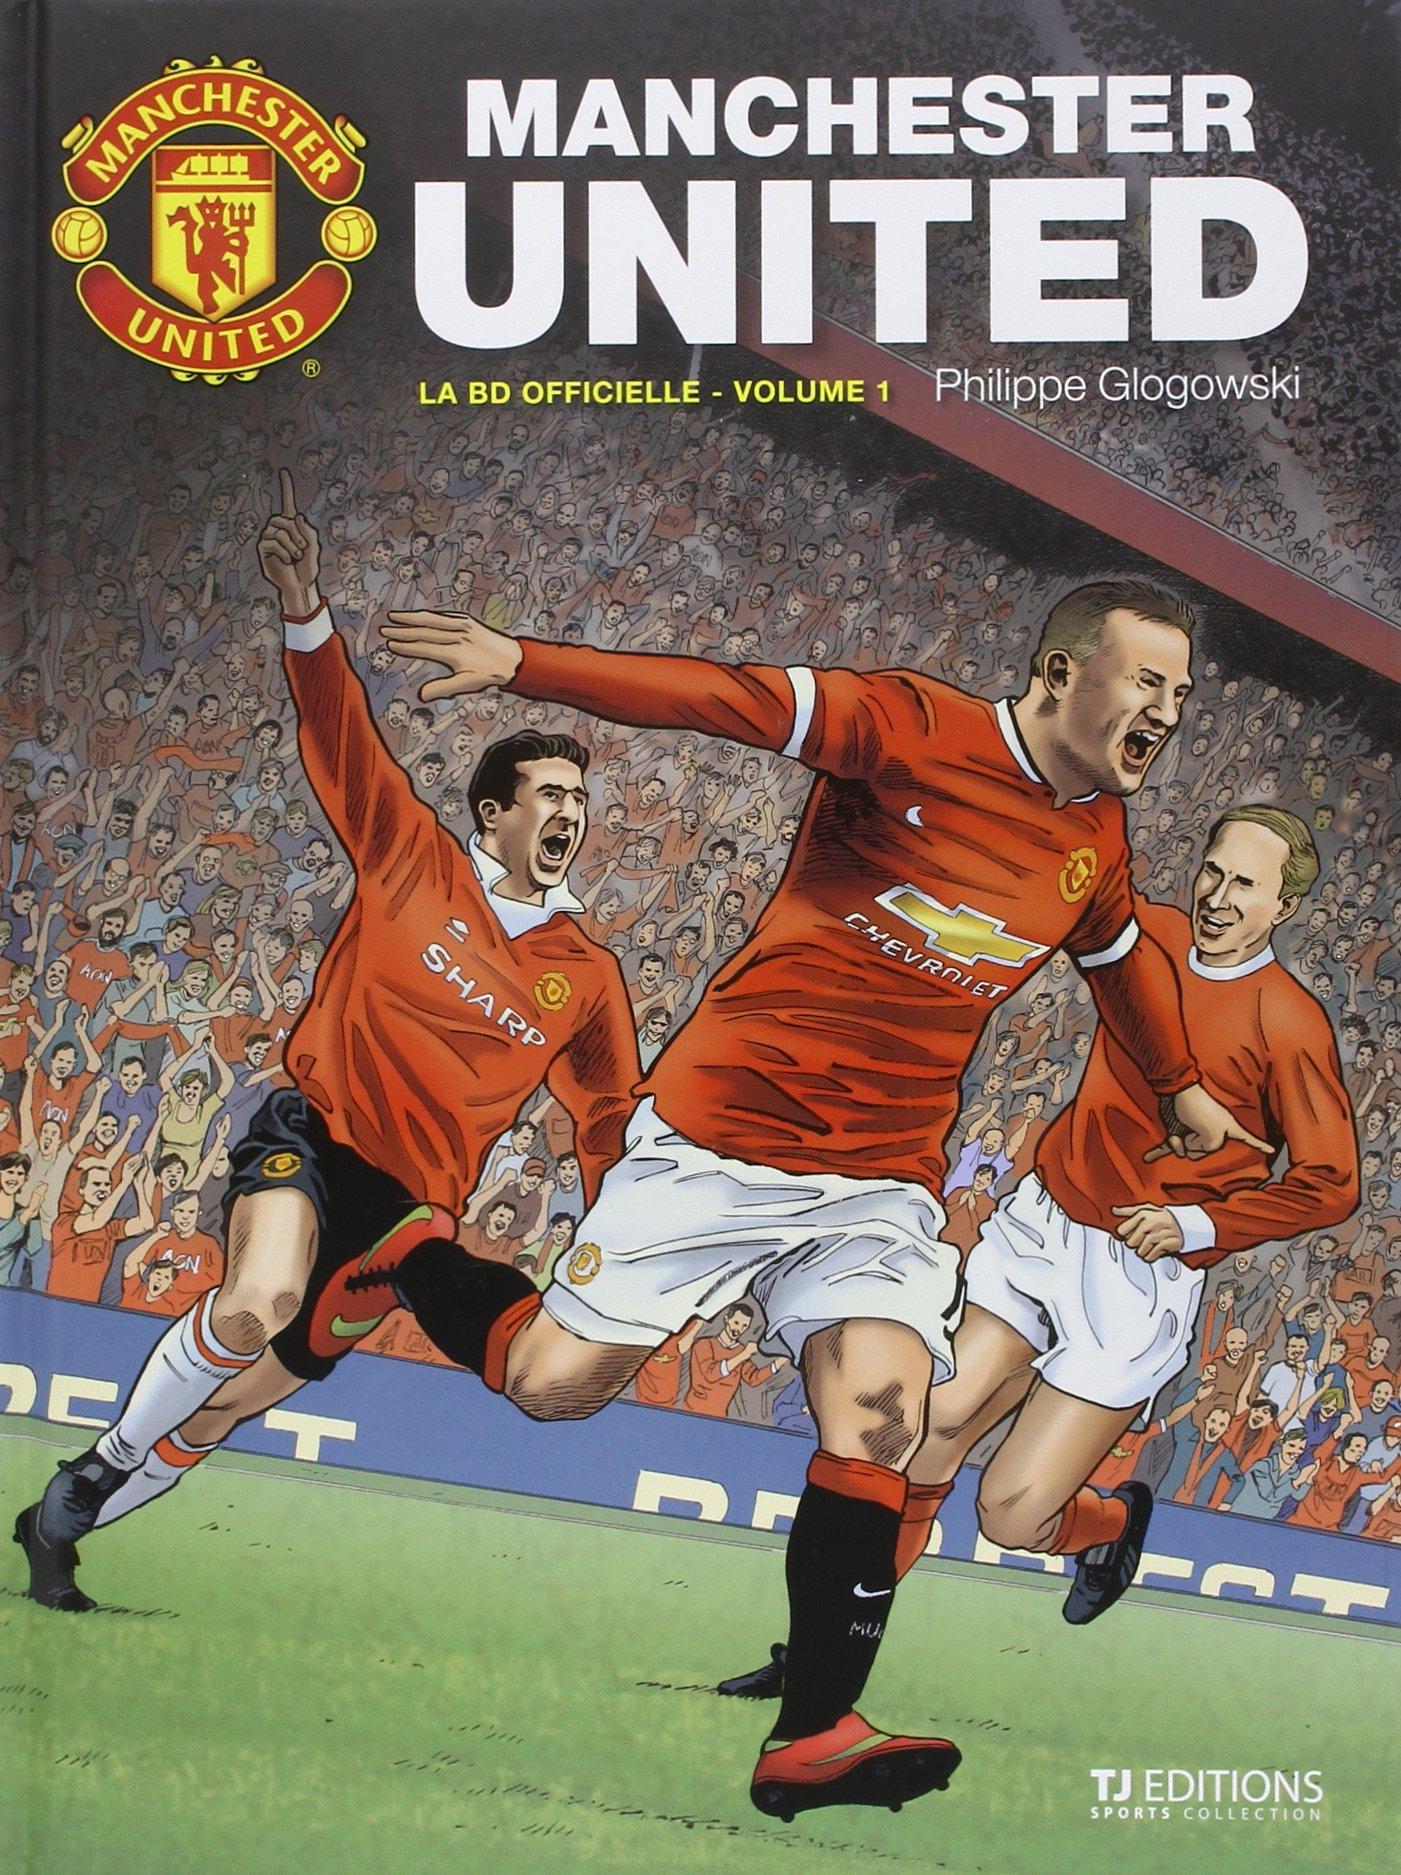 Manchester United - la BD officielle T1: Amazon.fr: Philippe Glogowski:  Livres